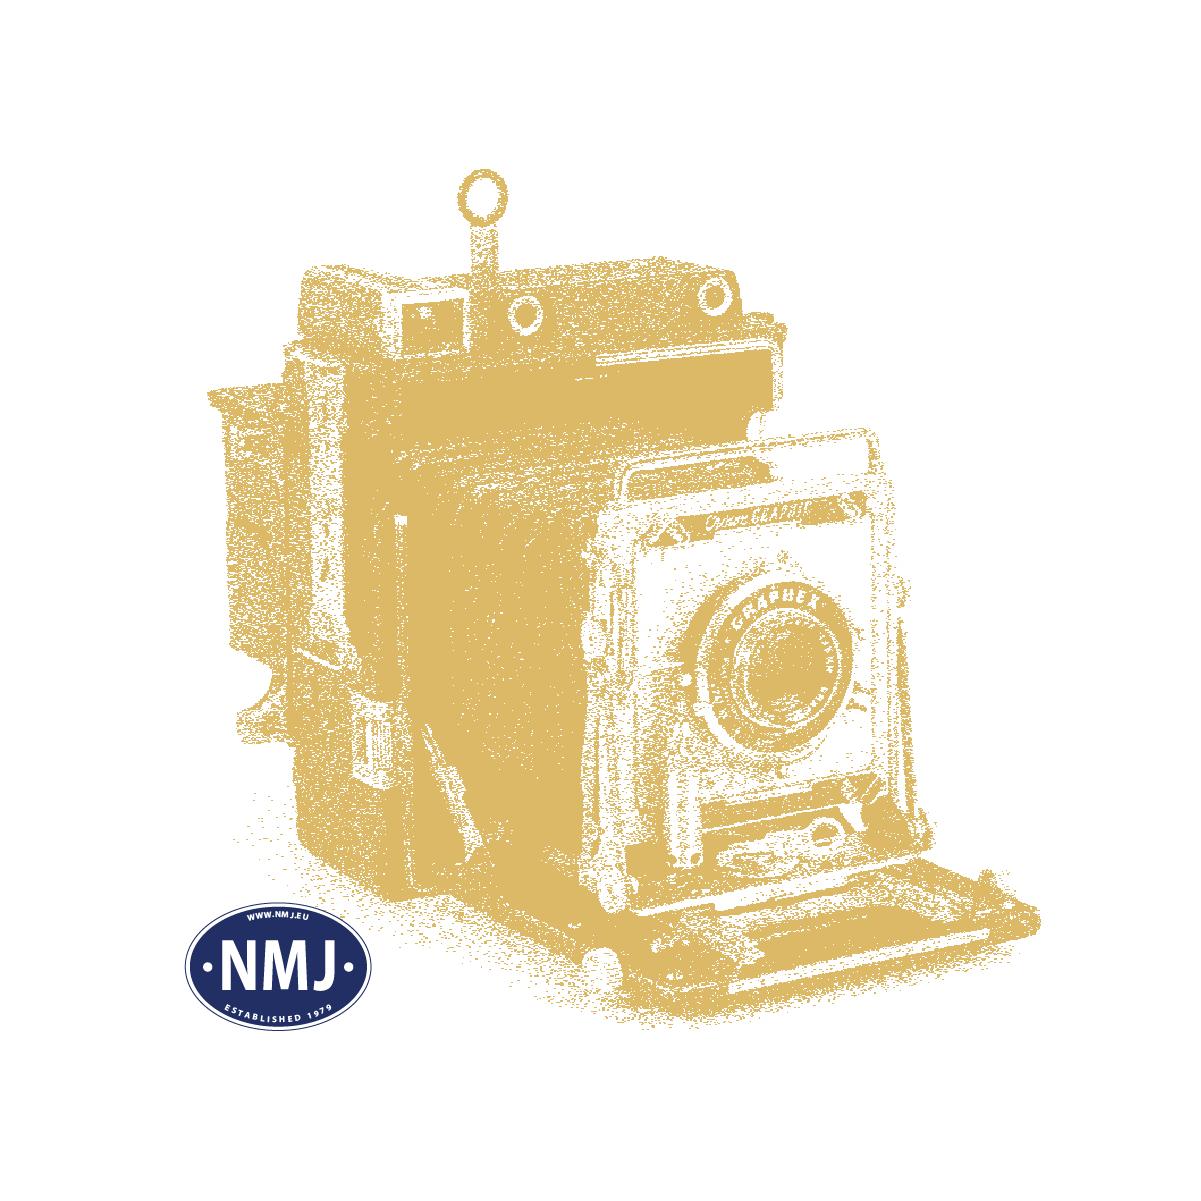 NMJT245302 - NMJ Topline CFL 1603, 0-Scale, DCC Sound